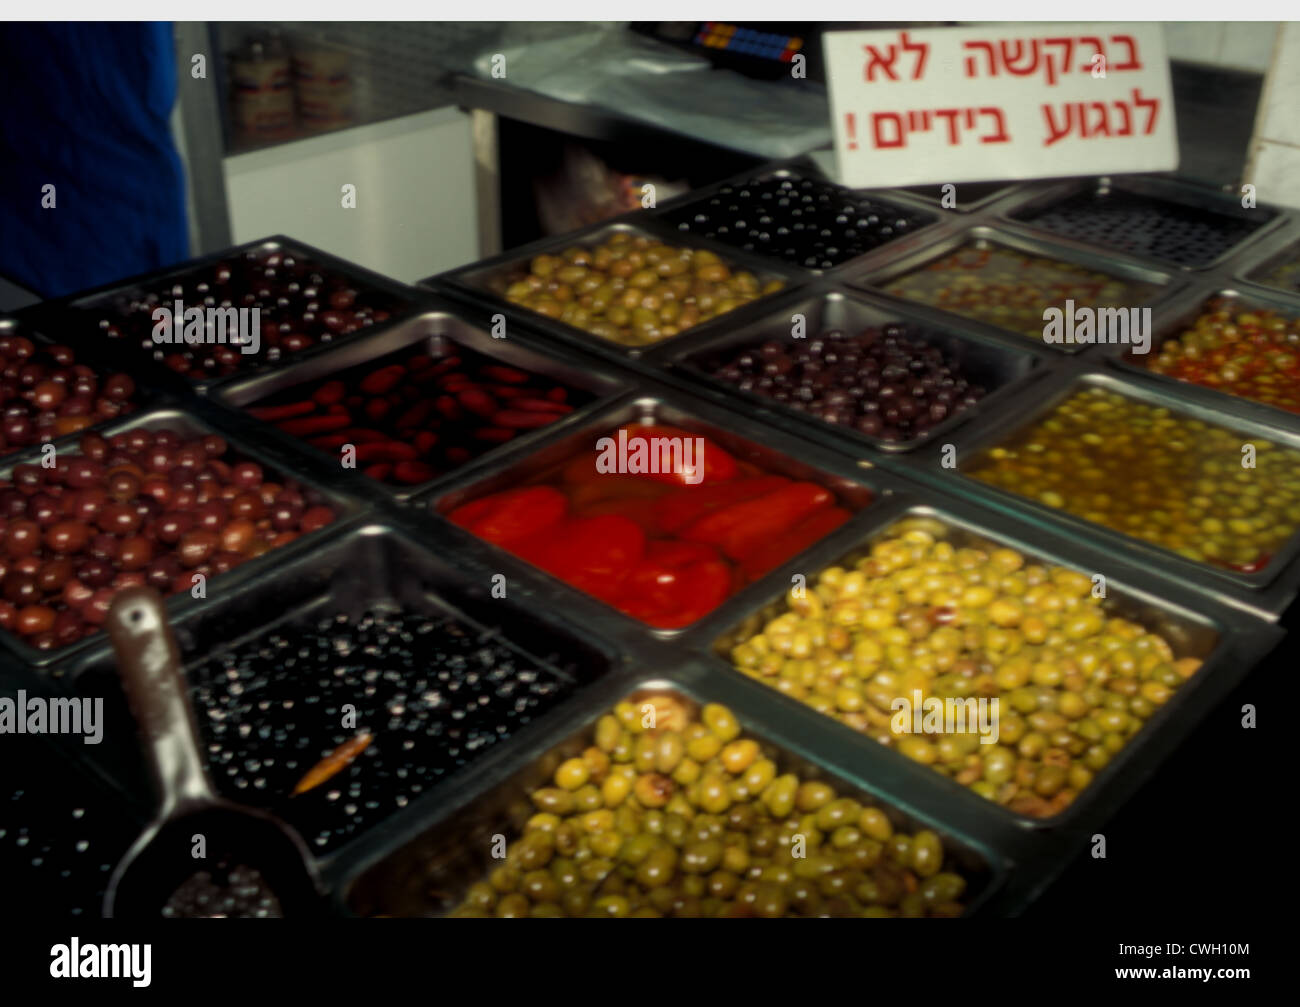 Preserved olives and peppers Carmel Street market, Tel Aviv, Israel - Stock Image